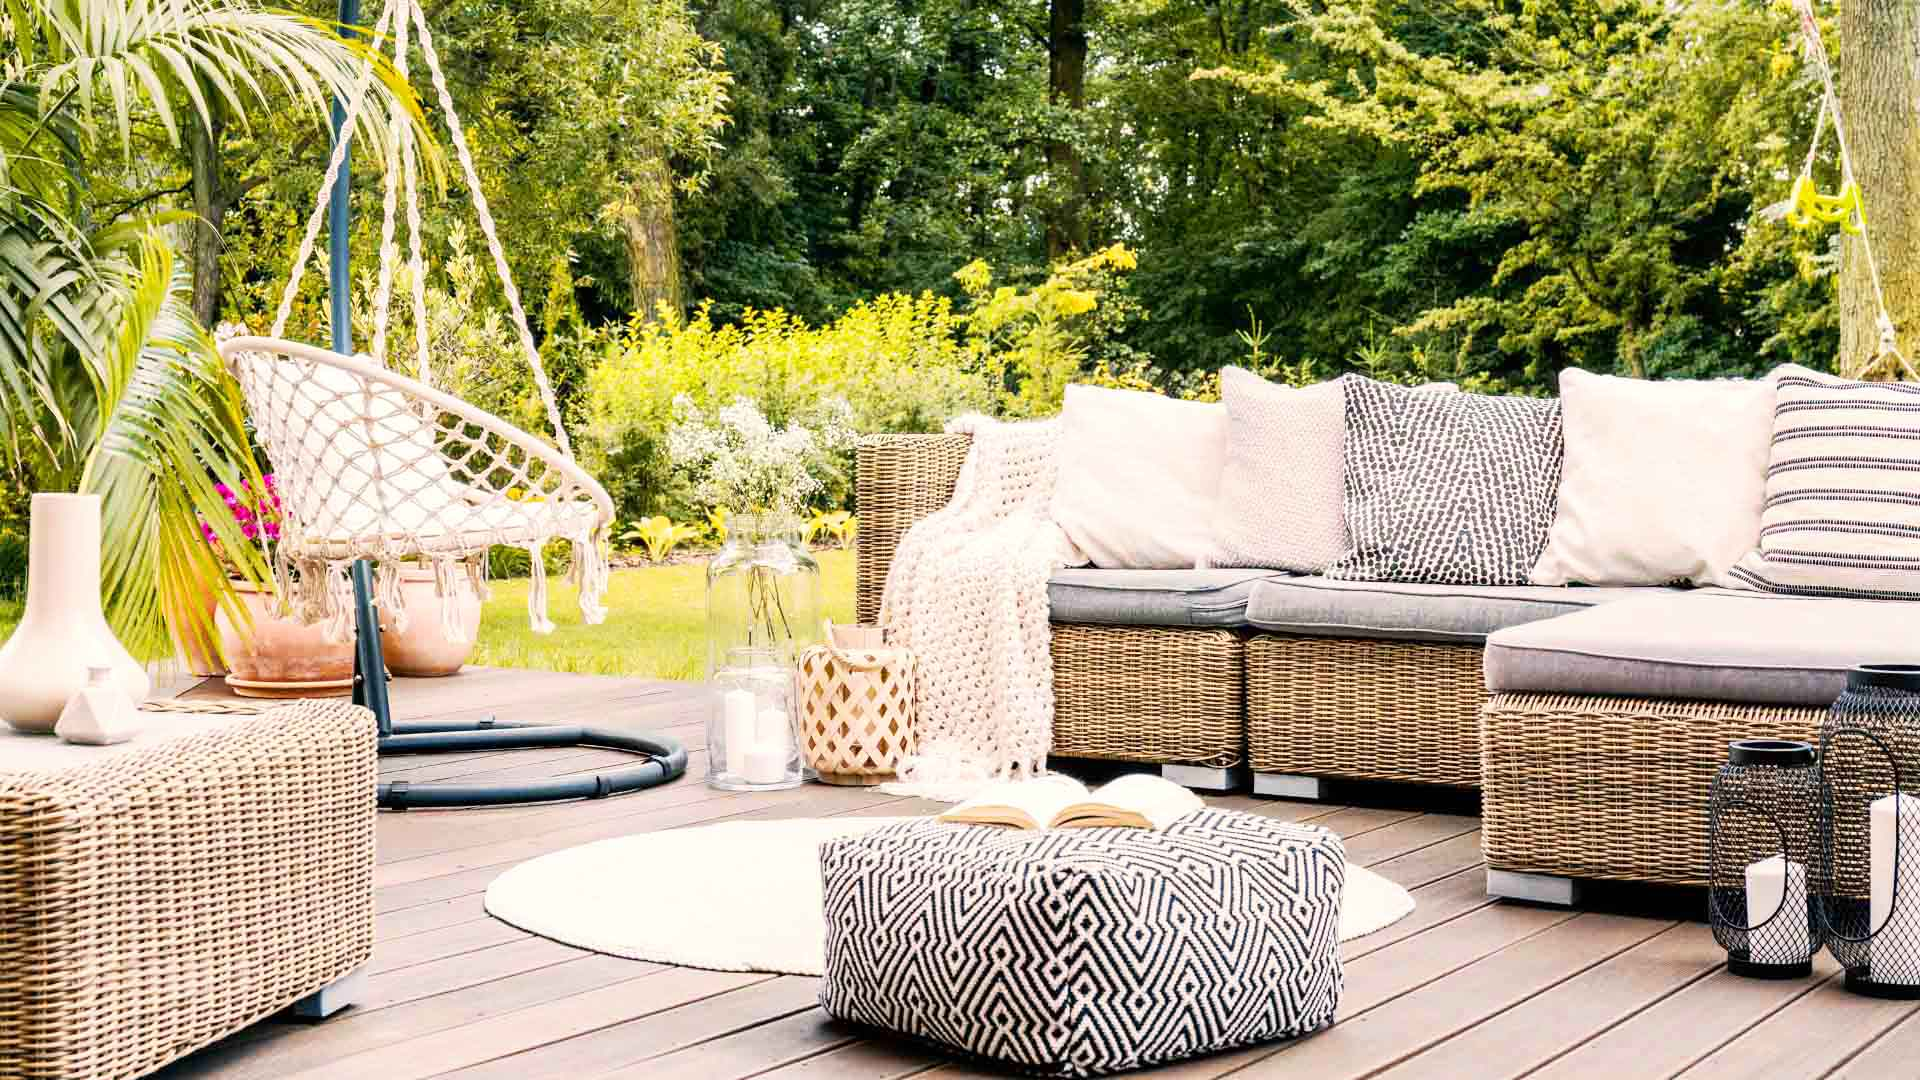 chic outdoor oasis patio ideas